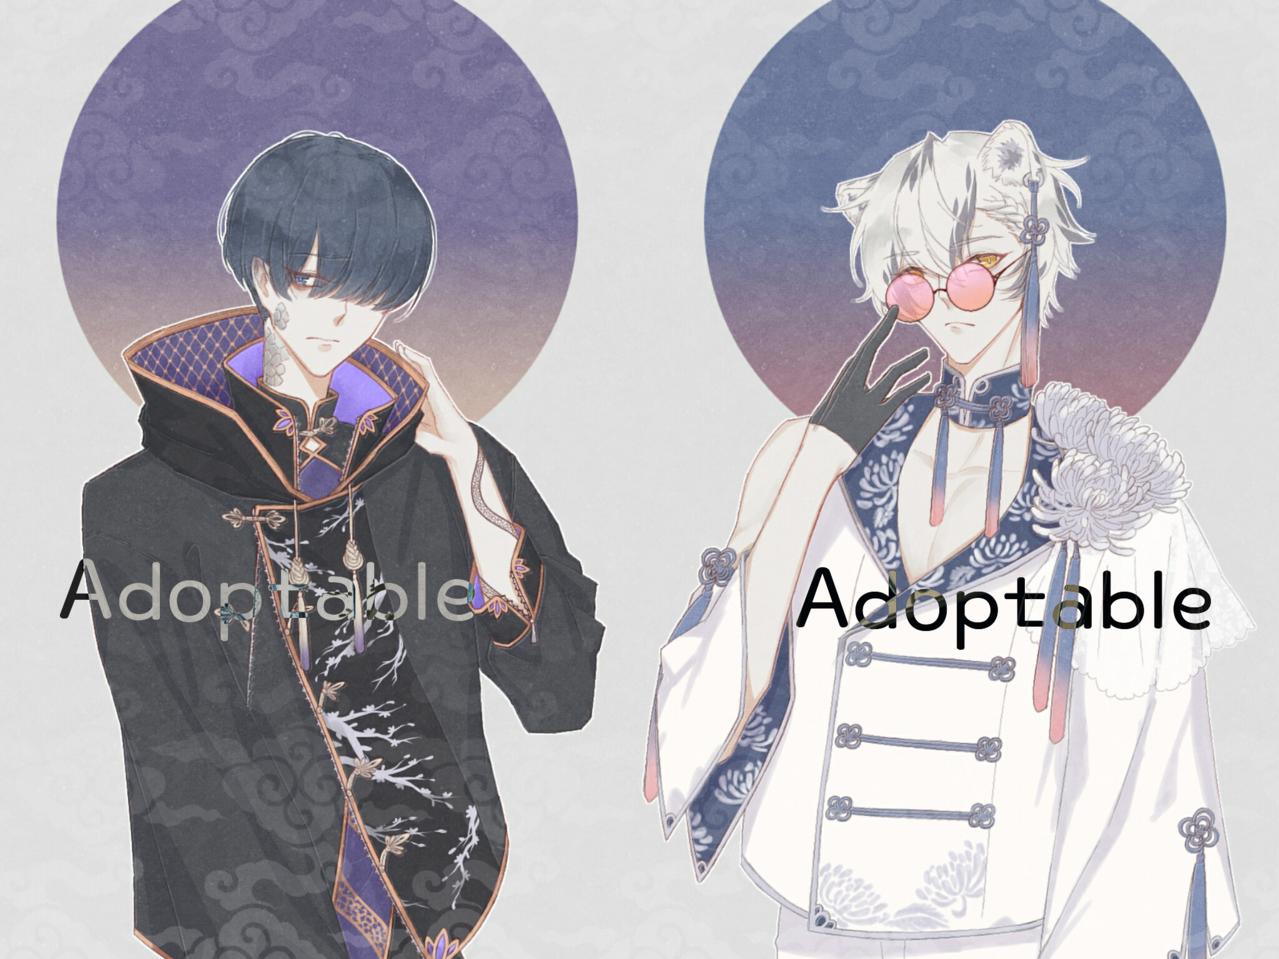 Adoptable Illust of 十四 | TOYO medibangpaint Adoptable